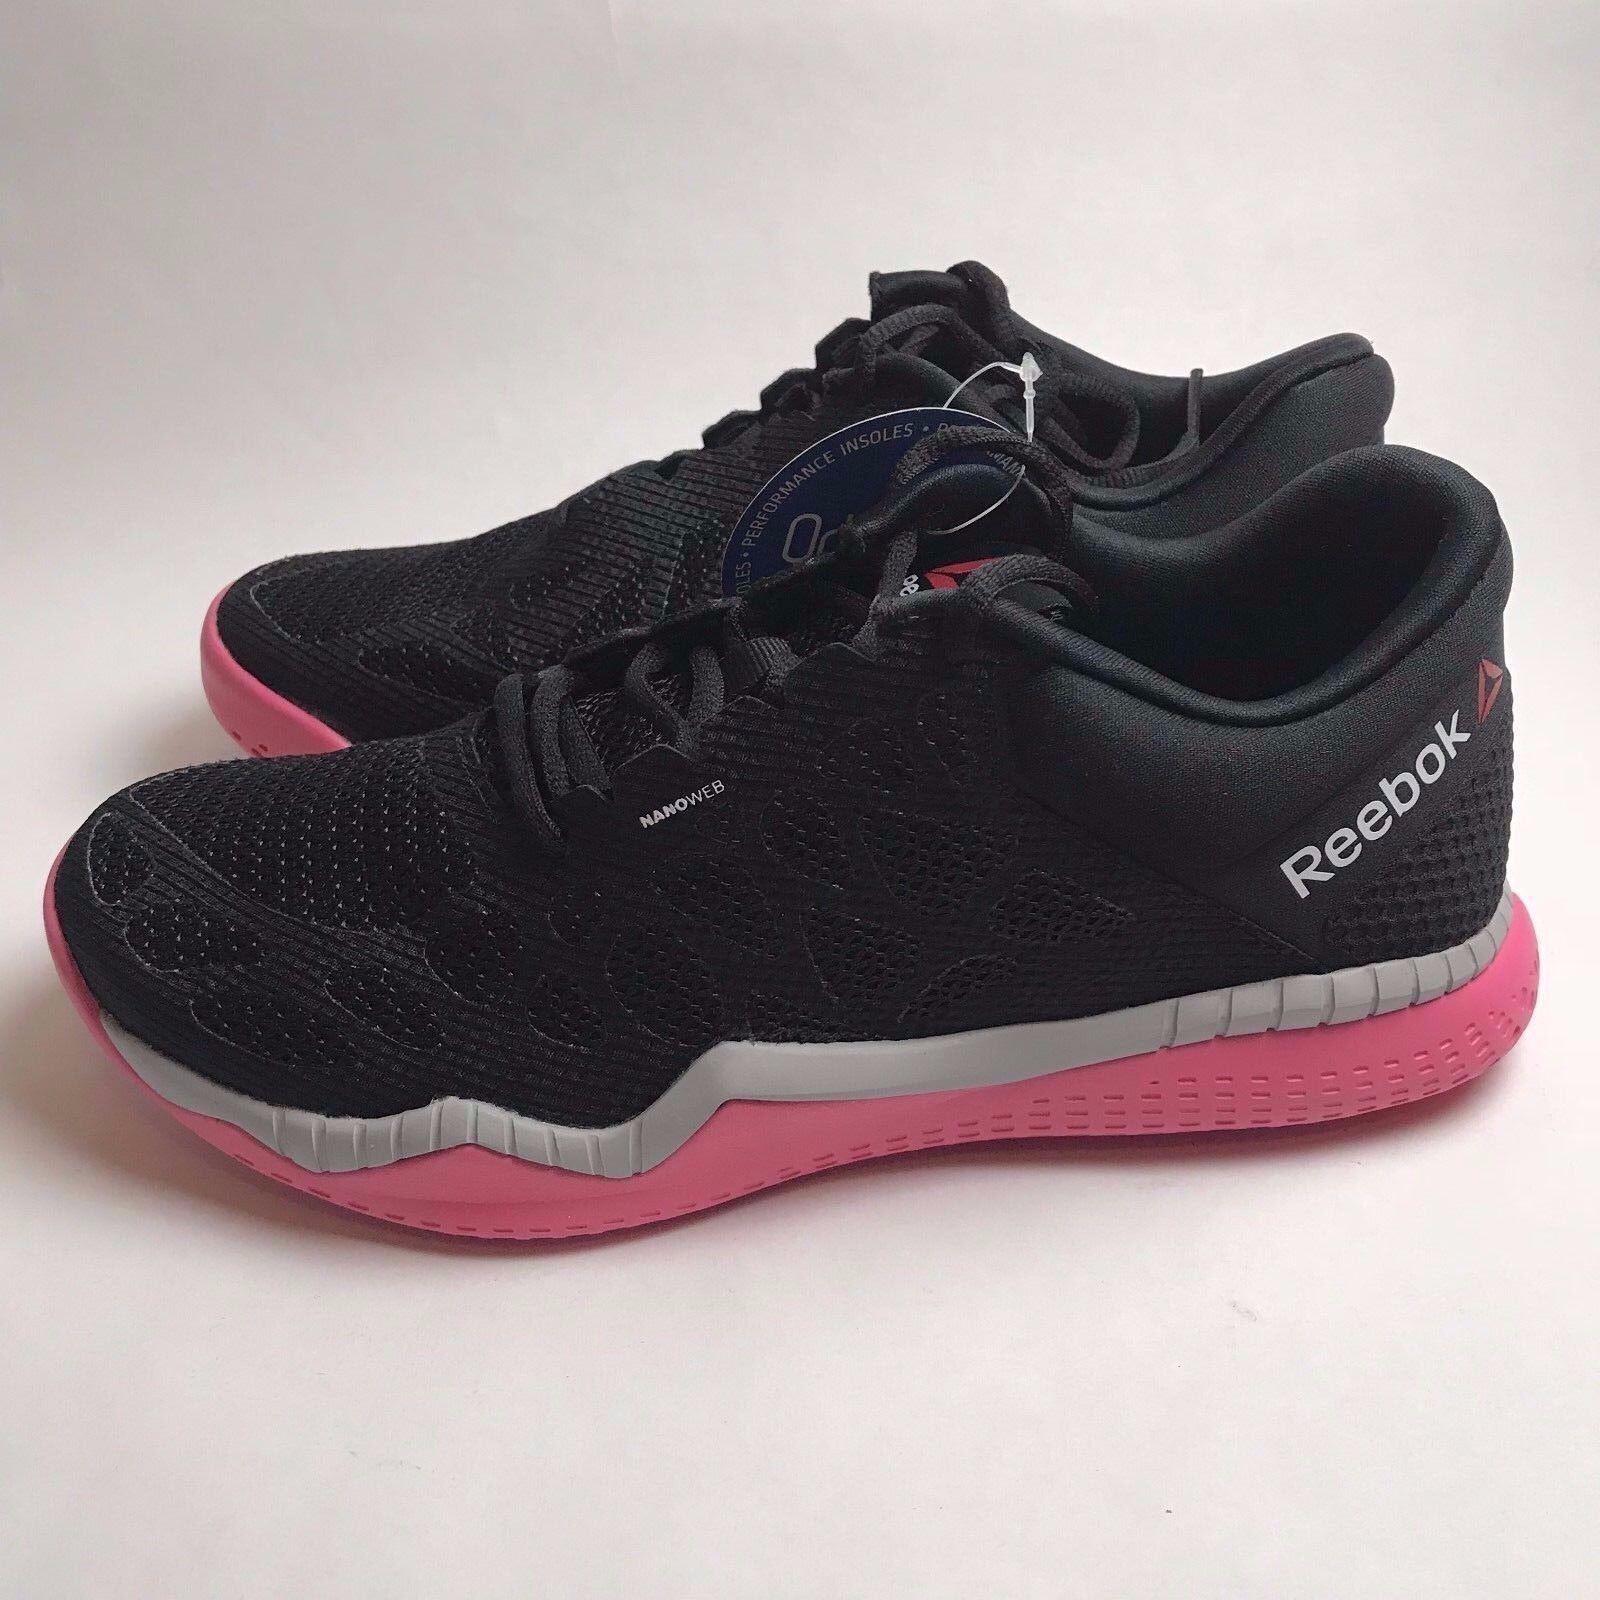 Reebok Zprint Train [V72199] Black & Pink Women's Cross Training Shoes Size: 8.5